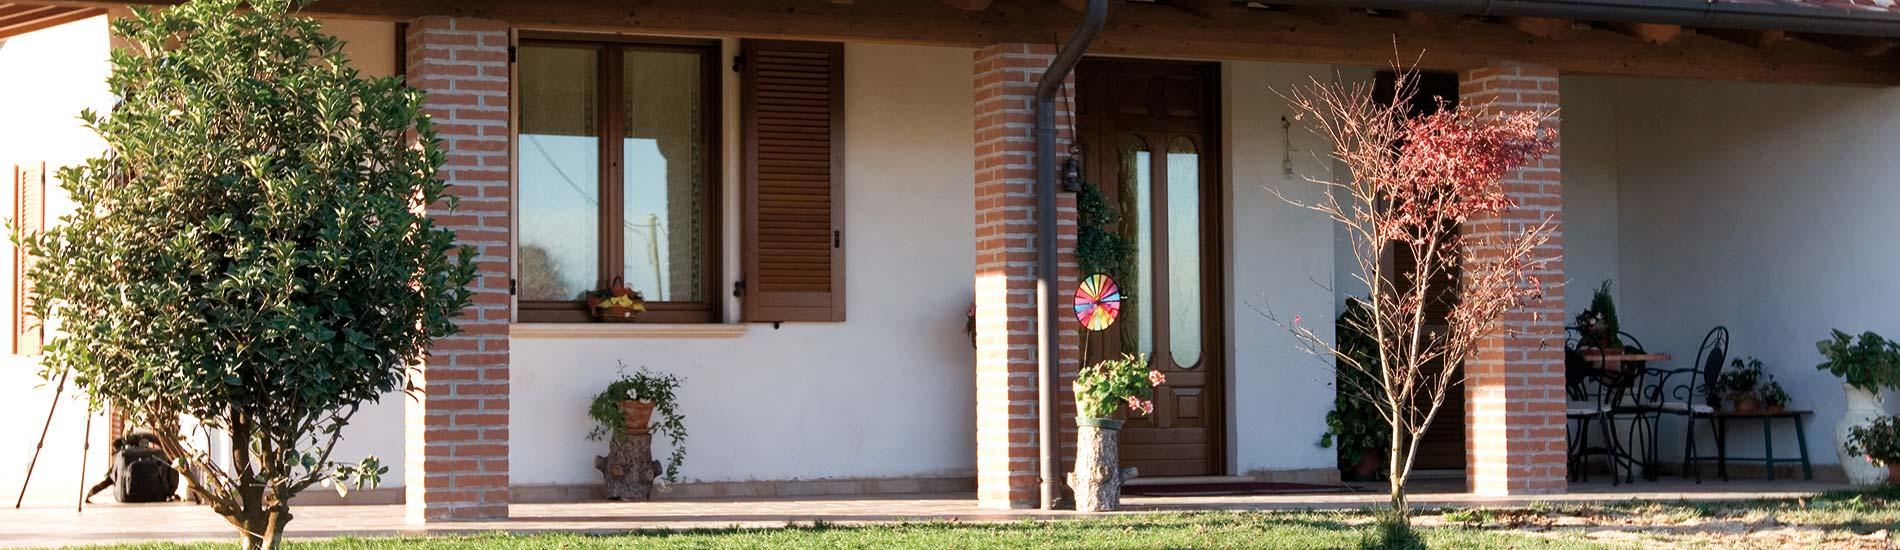 Serramenti per nuove abitazioni di lusso mazzini serramenti for Abitazioni di lusso